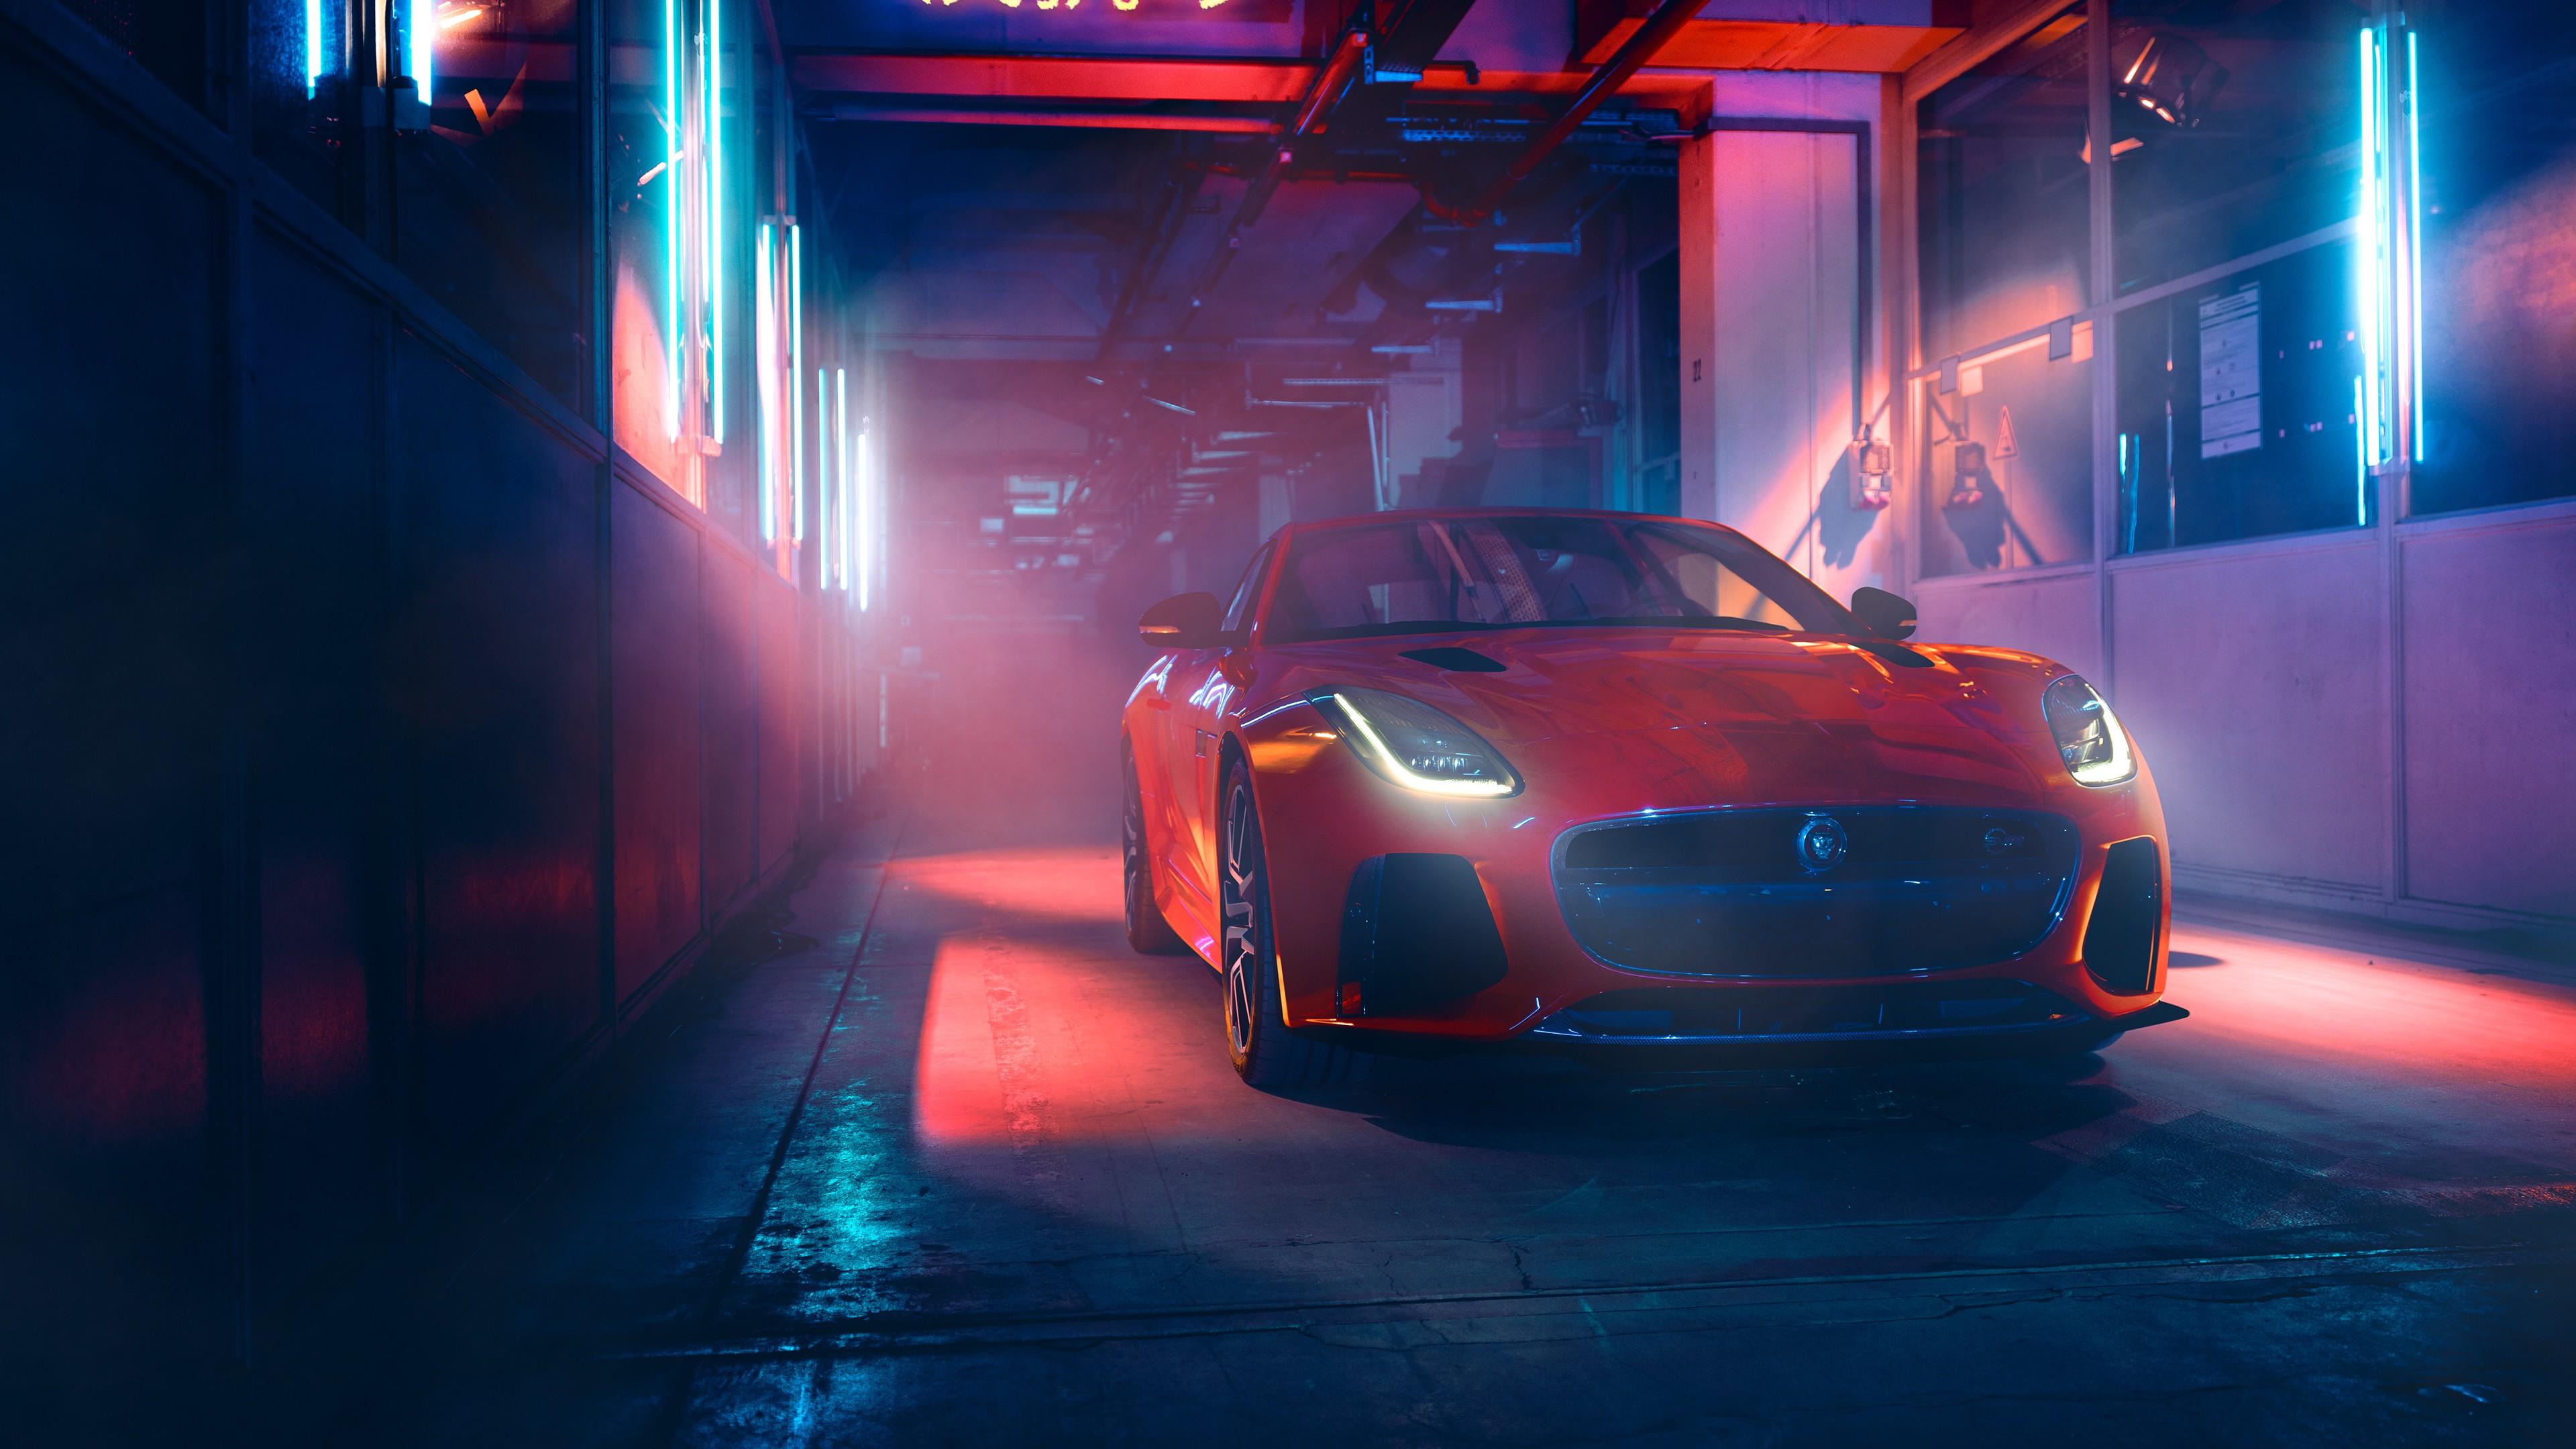 Wallpaper Jaguar F Type 2019 Cars luxury cars 4K Cars Bikes 3840x2160